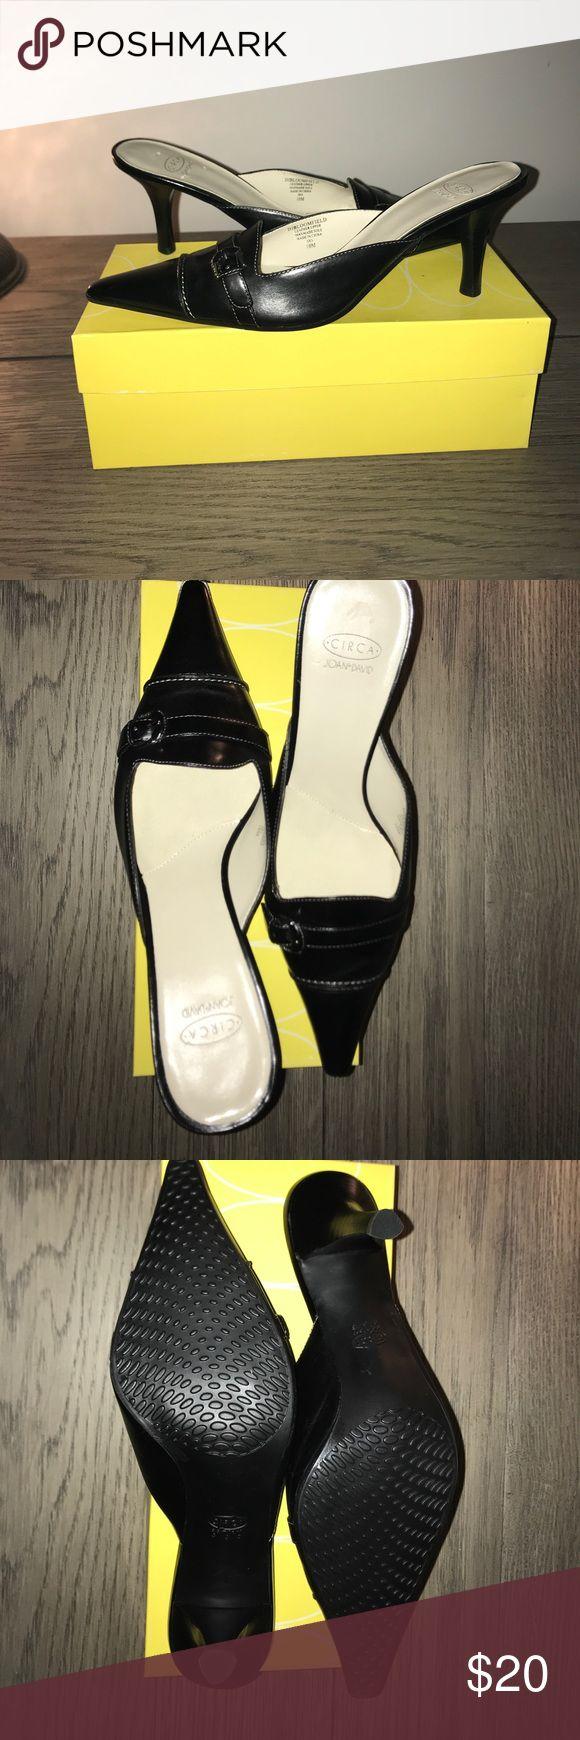 "Circa Joan and David Black leather slip-on Circa Joan and David, ""DJ Bloomfeld"" black leather slip on pumps.  Brand new, never worn! Joan & David Shoes Heels"